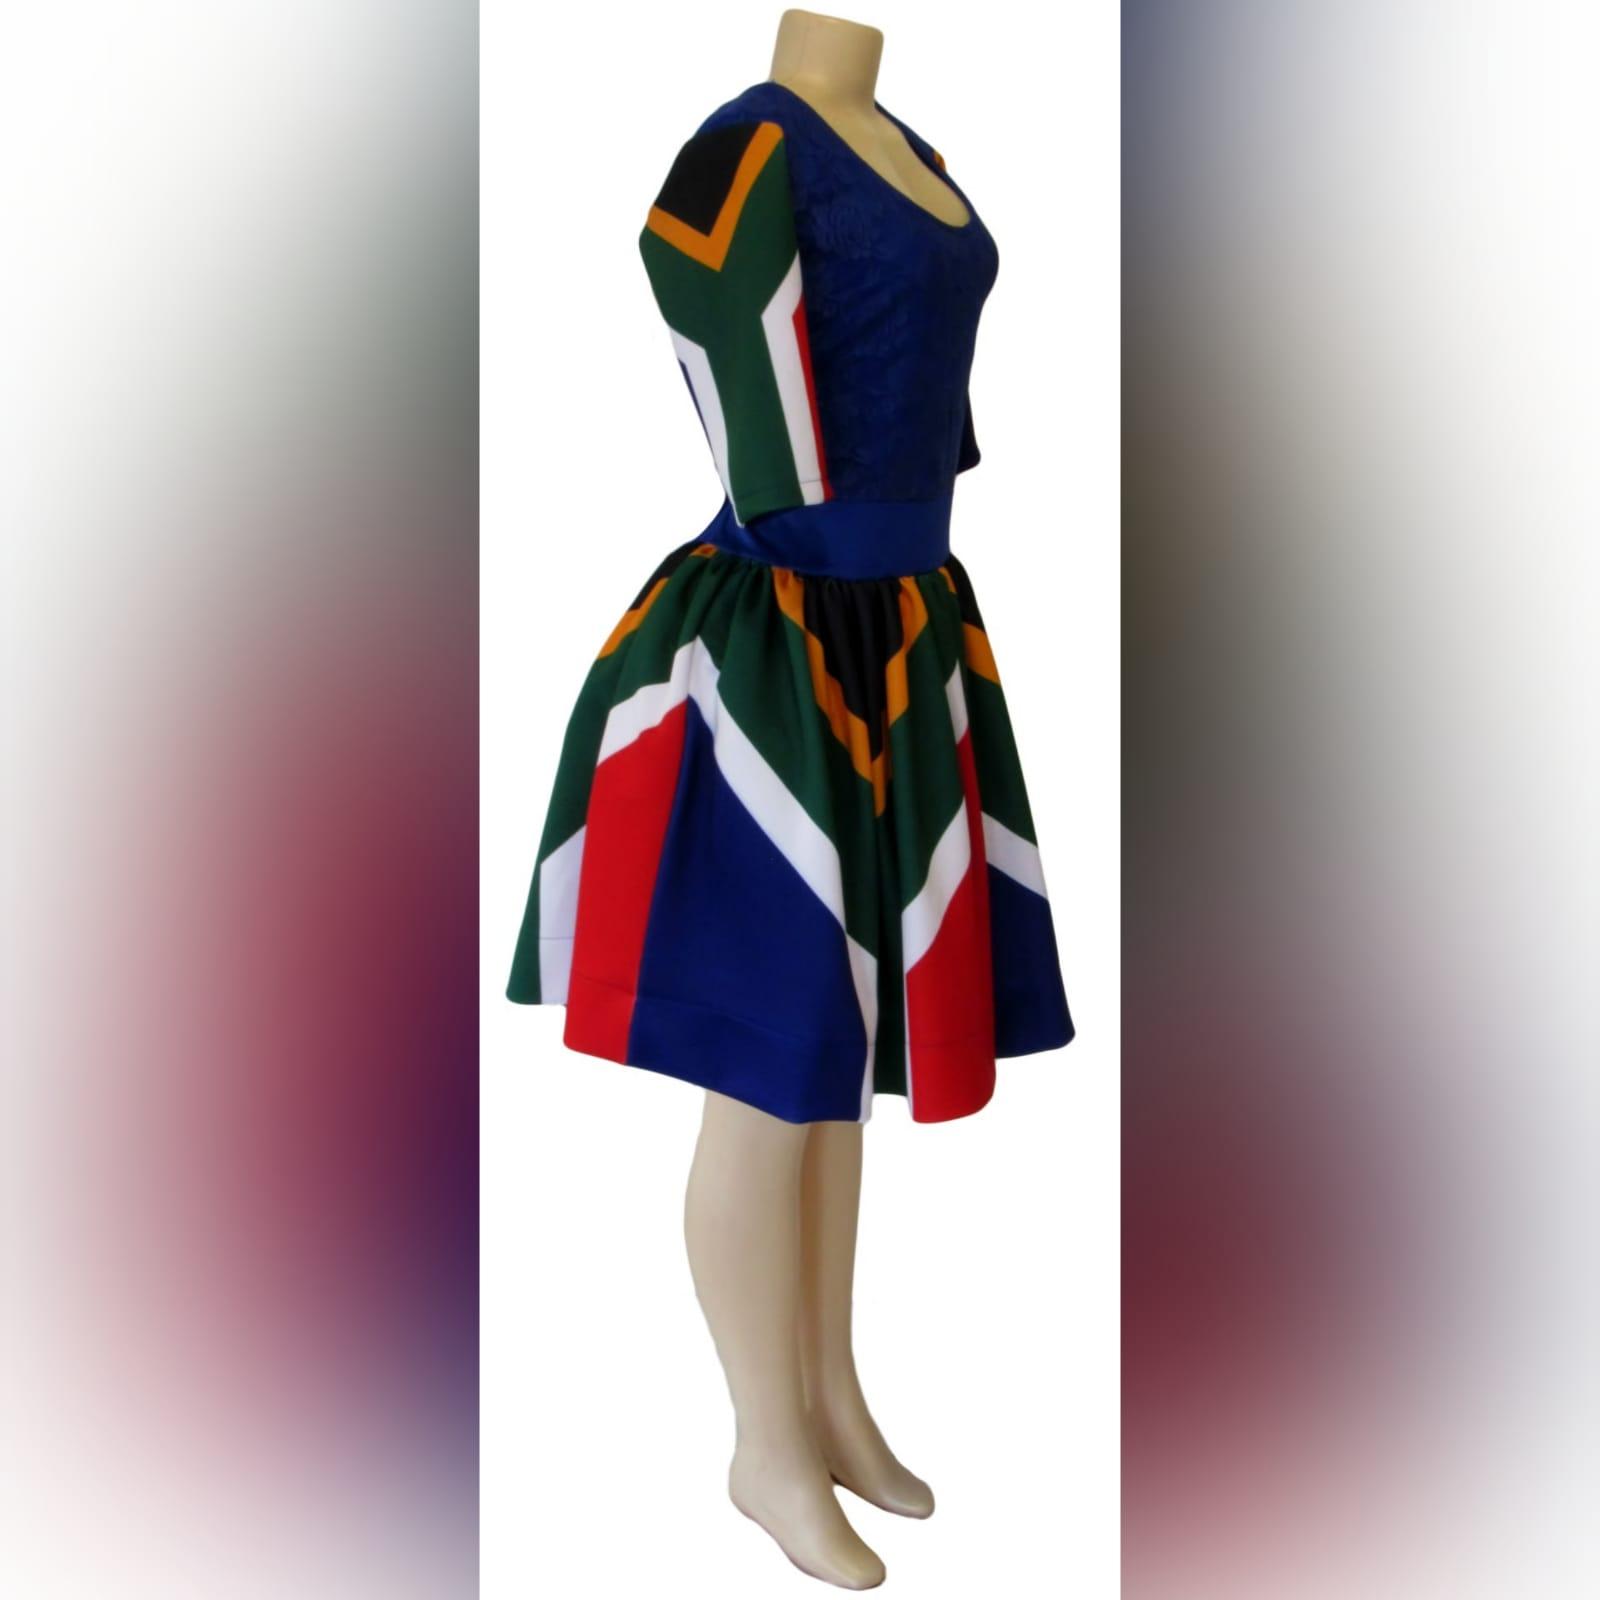 Royal blue sa flag short traditional dress 5 royal blue sa flag short traditional dress. With sa flag sleeves and a lace bodice. Traditional dress for graduation.